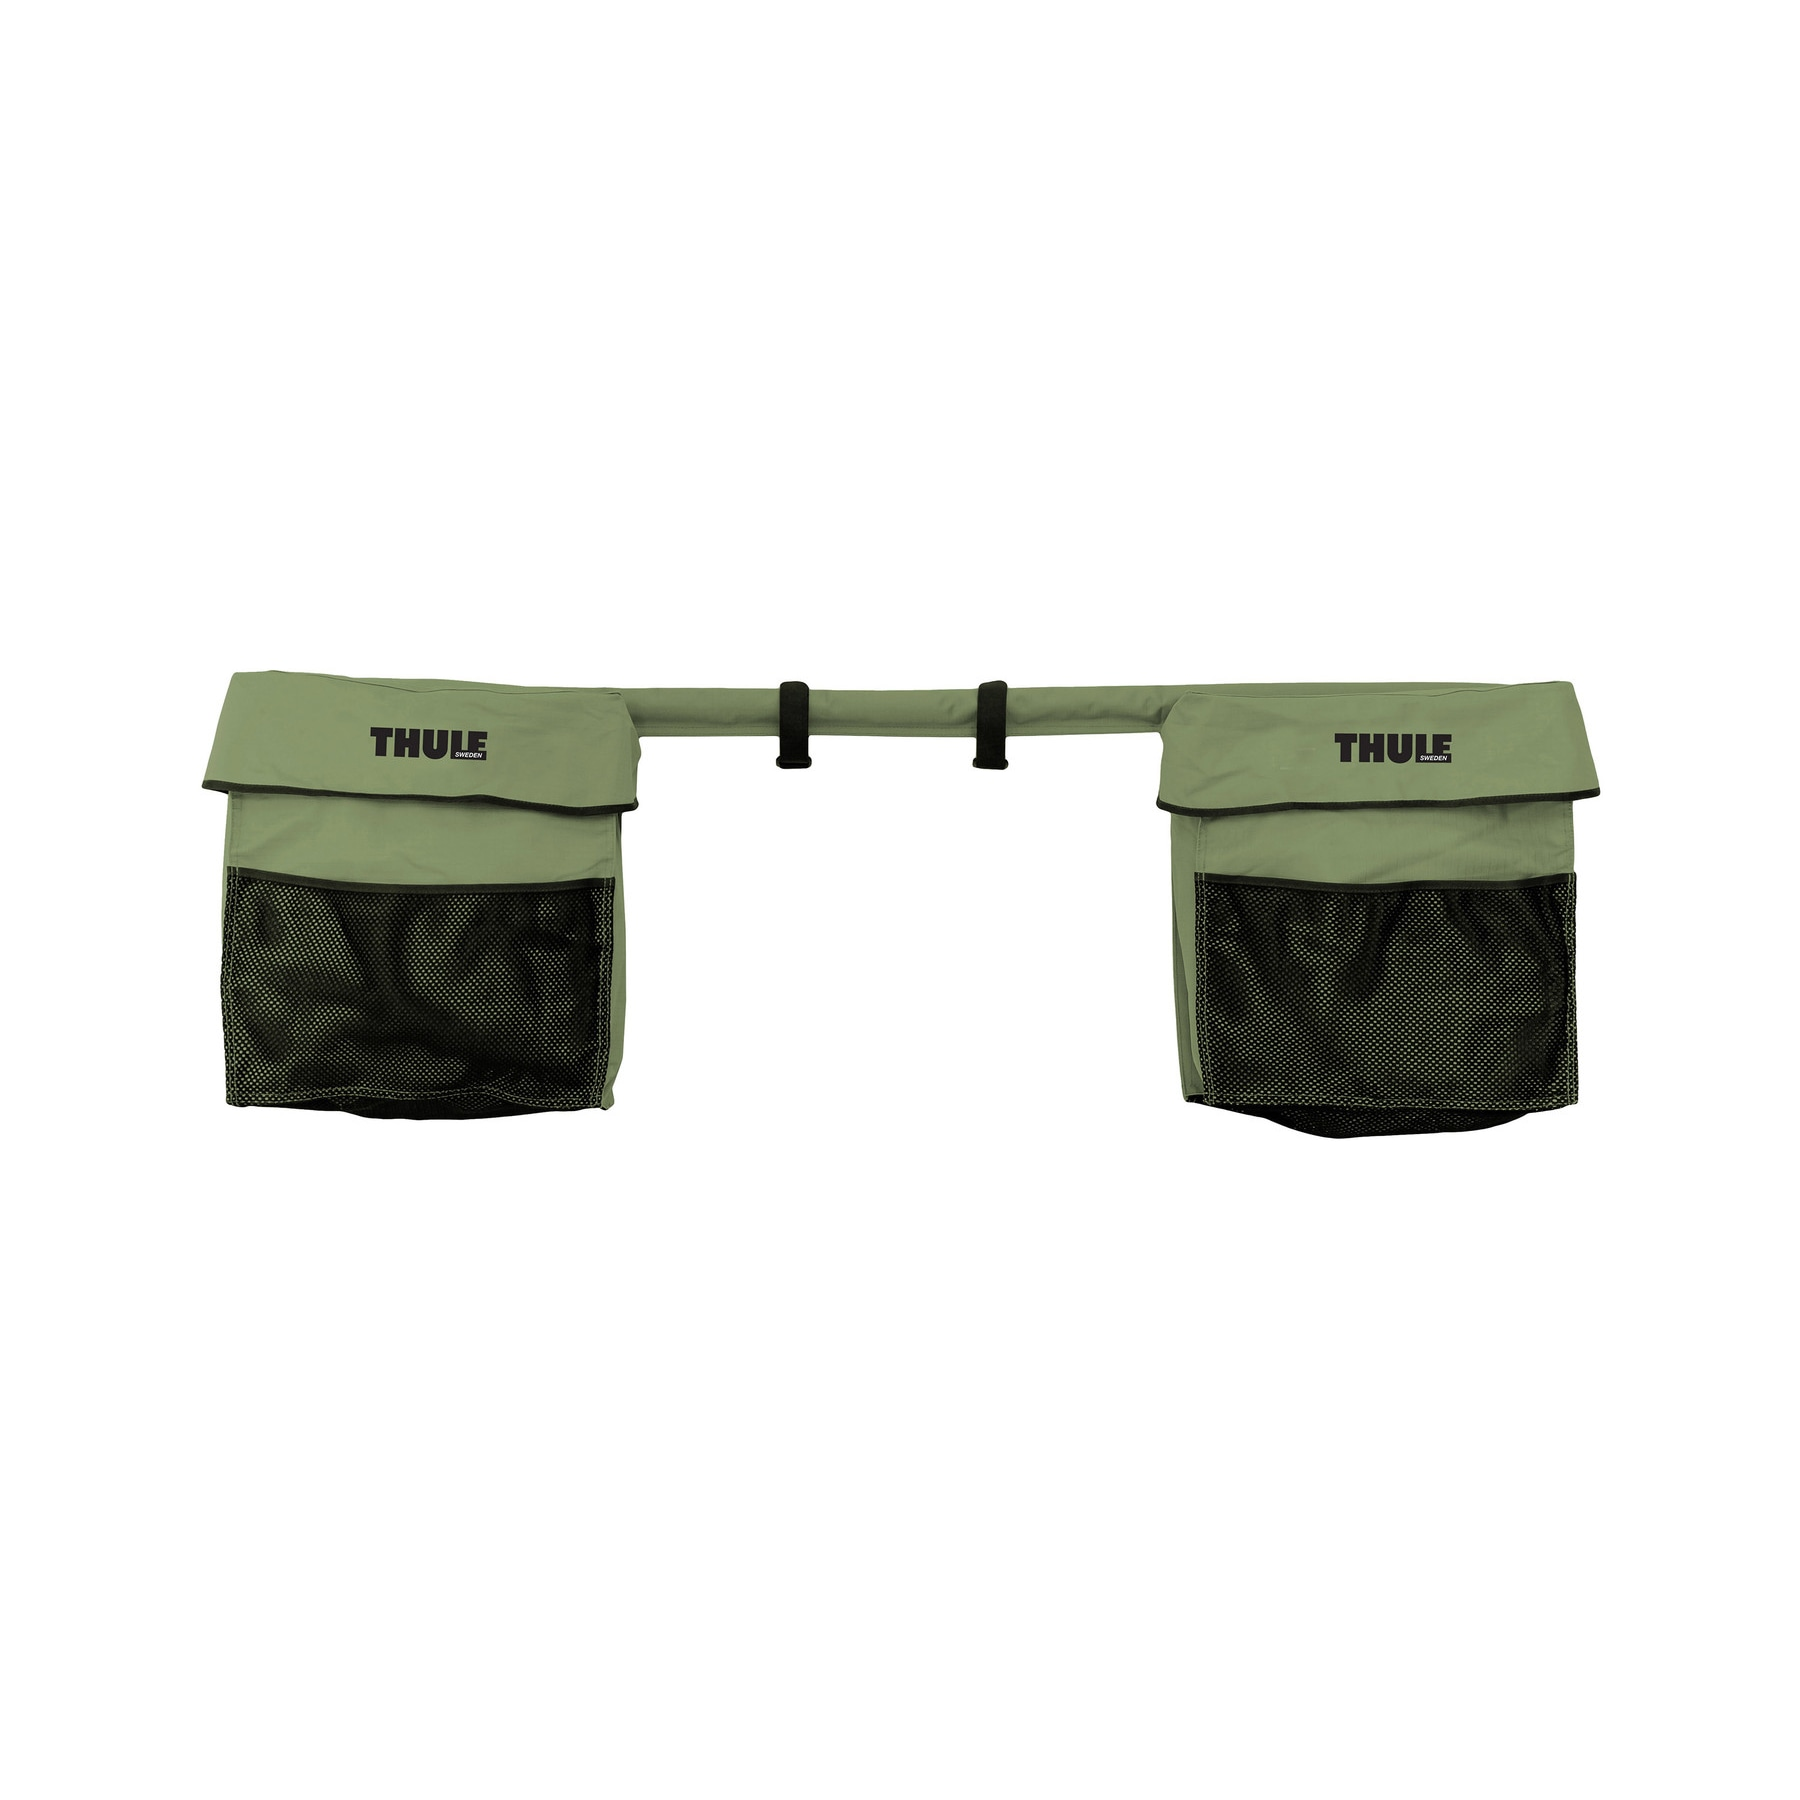 THULE TEPUI DOUBLE BOOT BAG